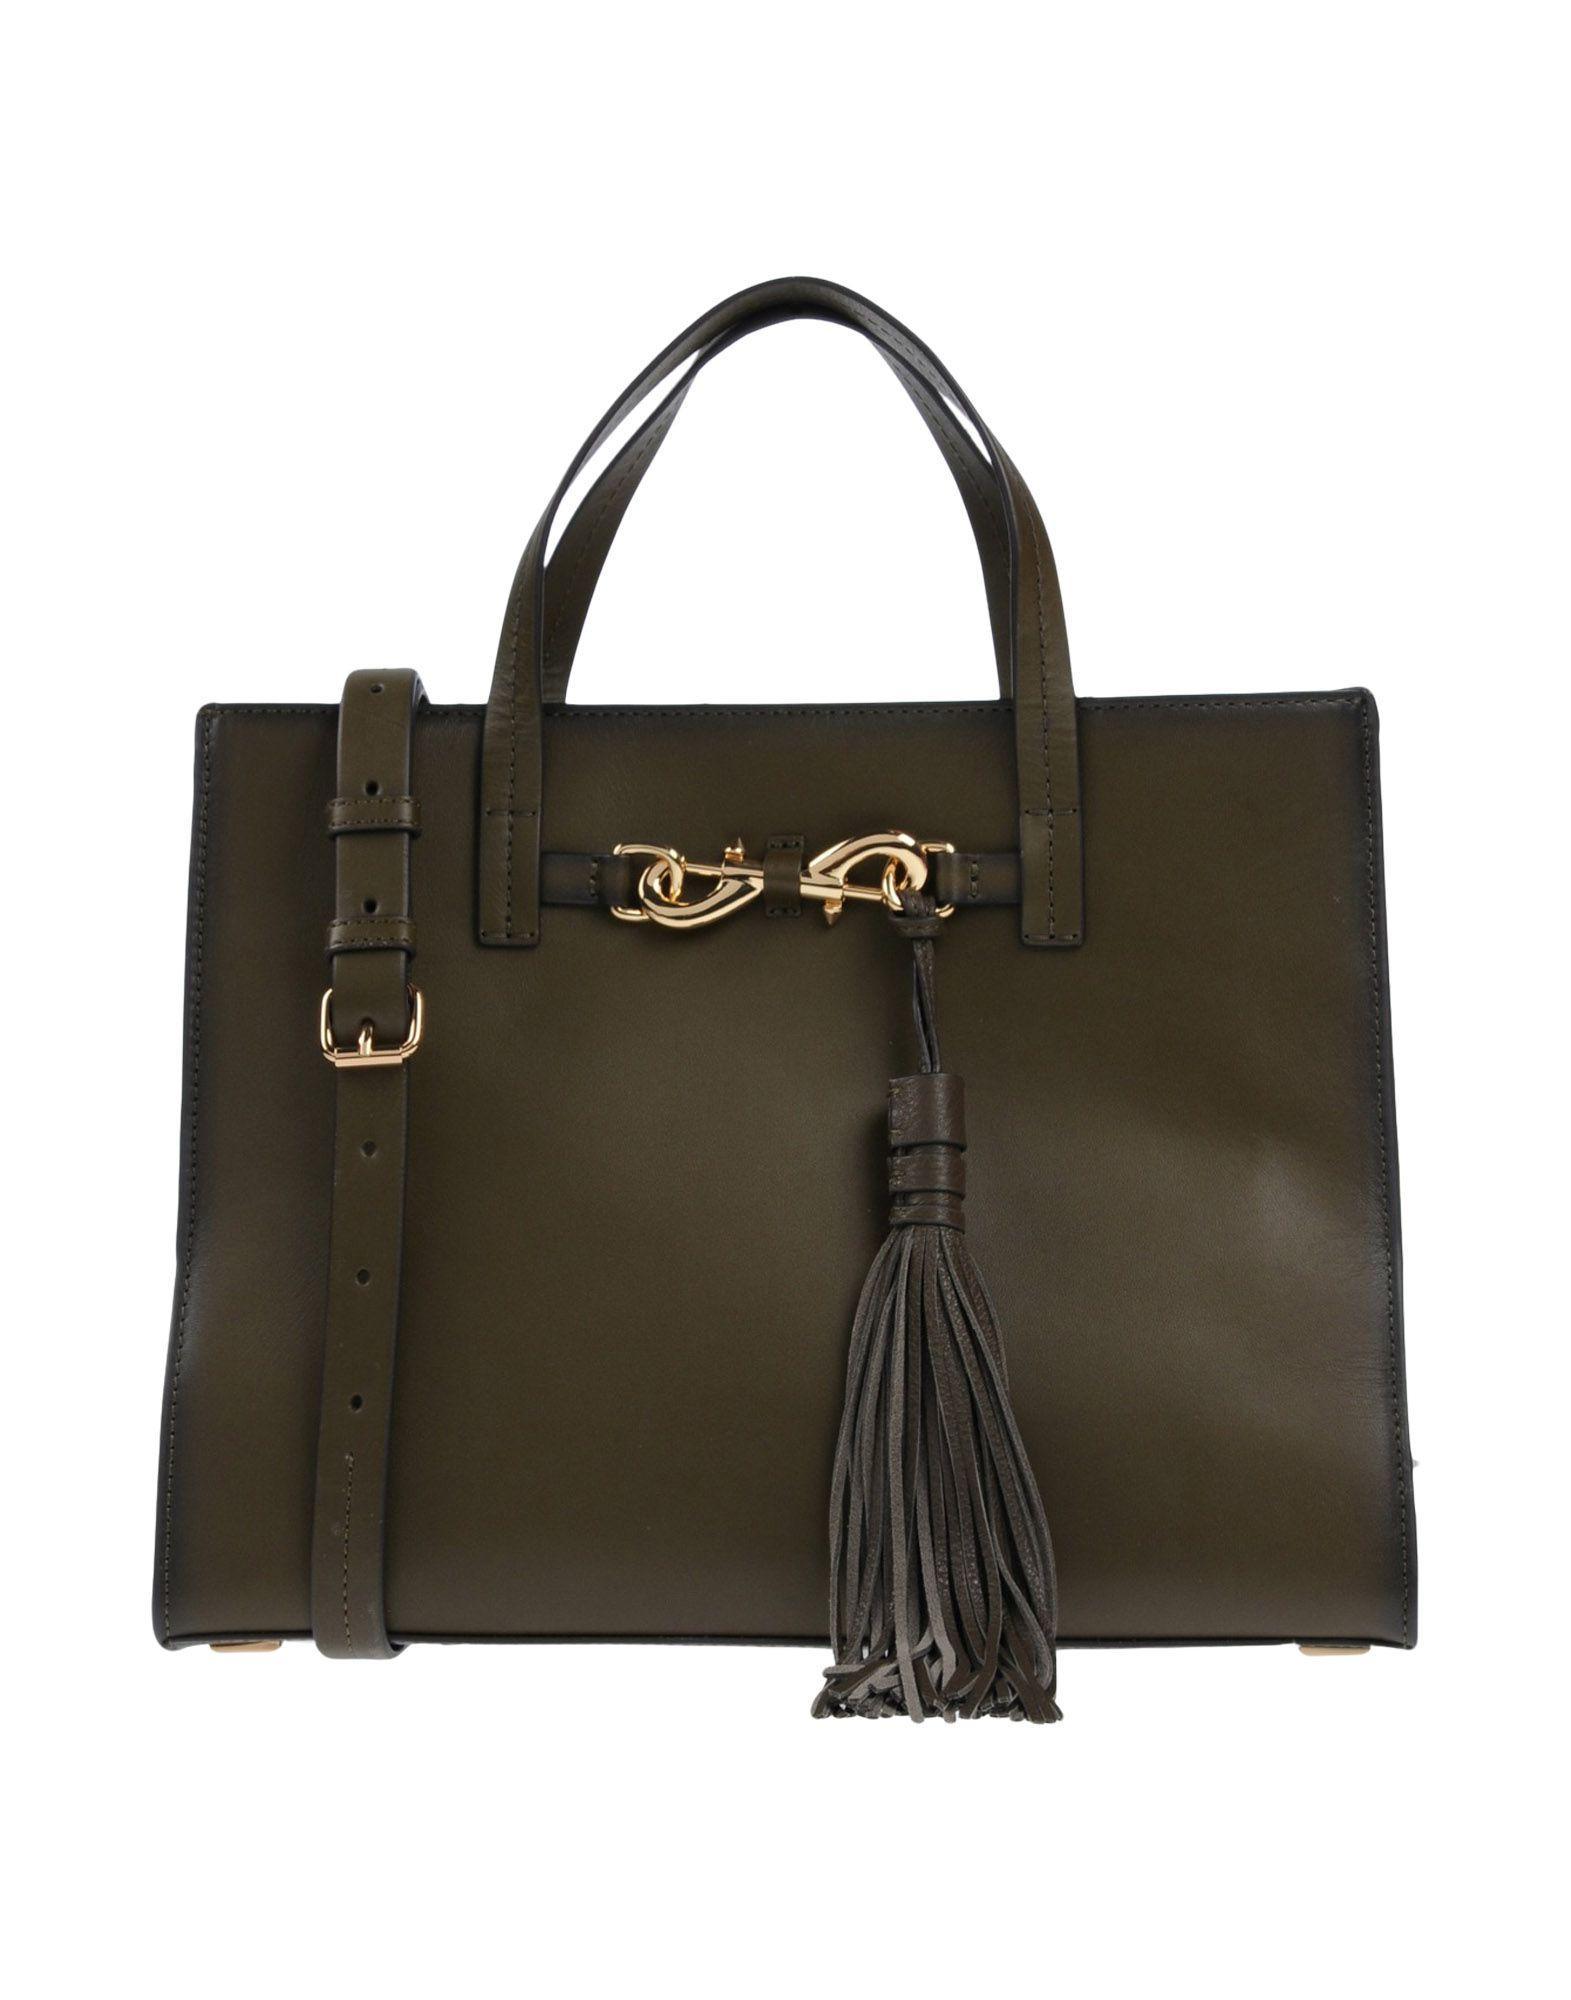 Rebecca Minkoff Handbag In Military Green